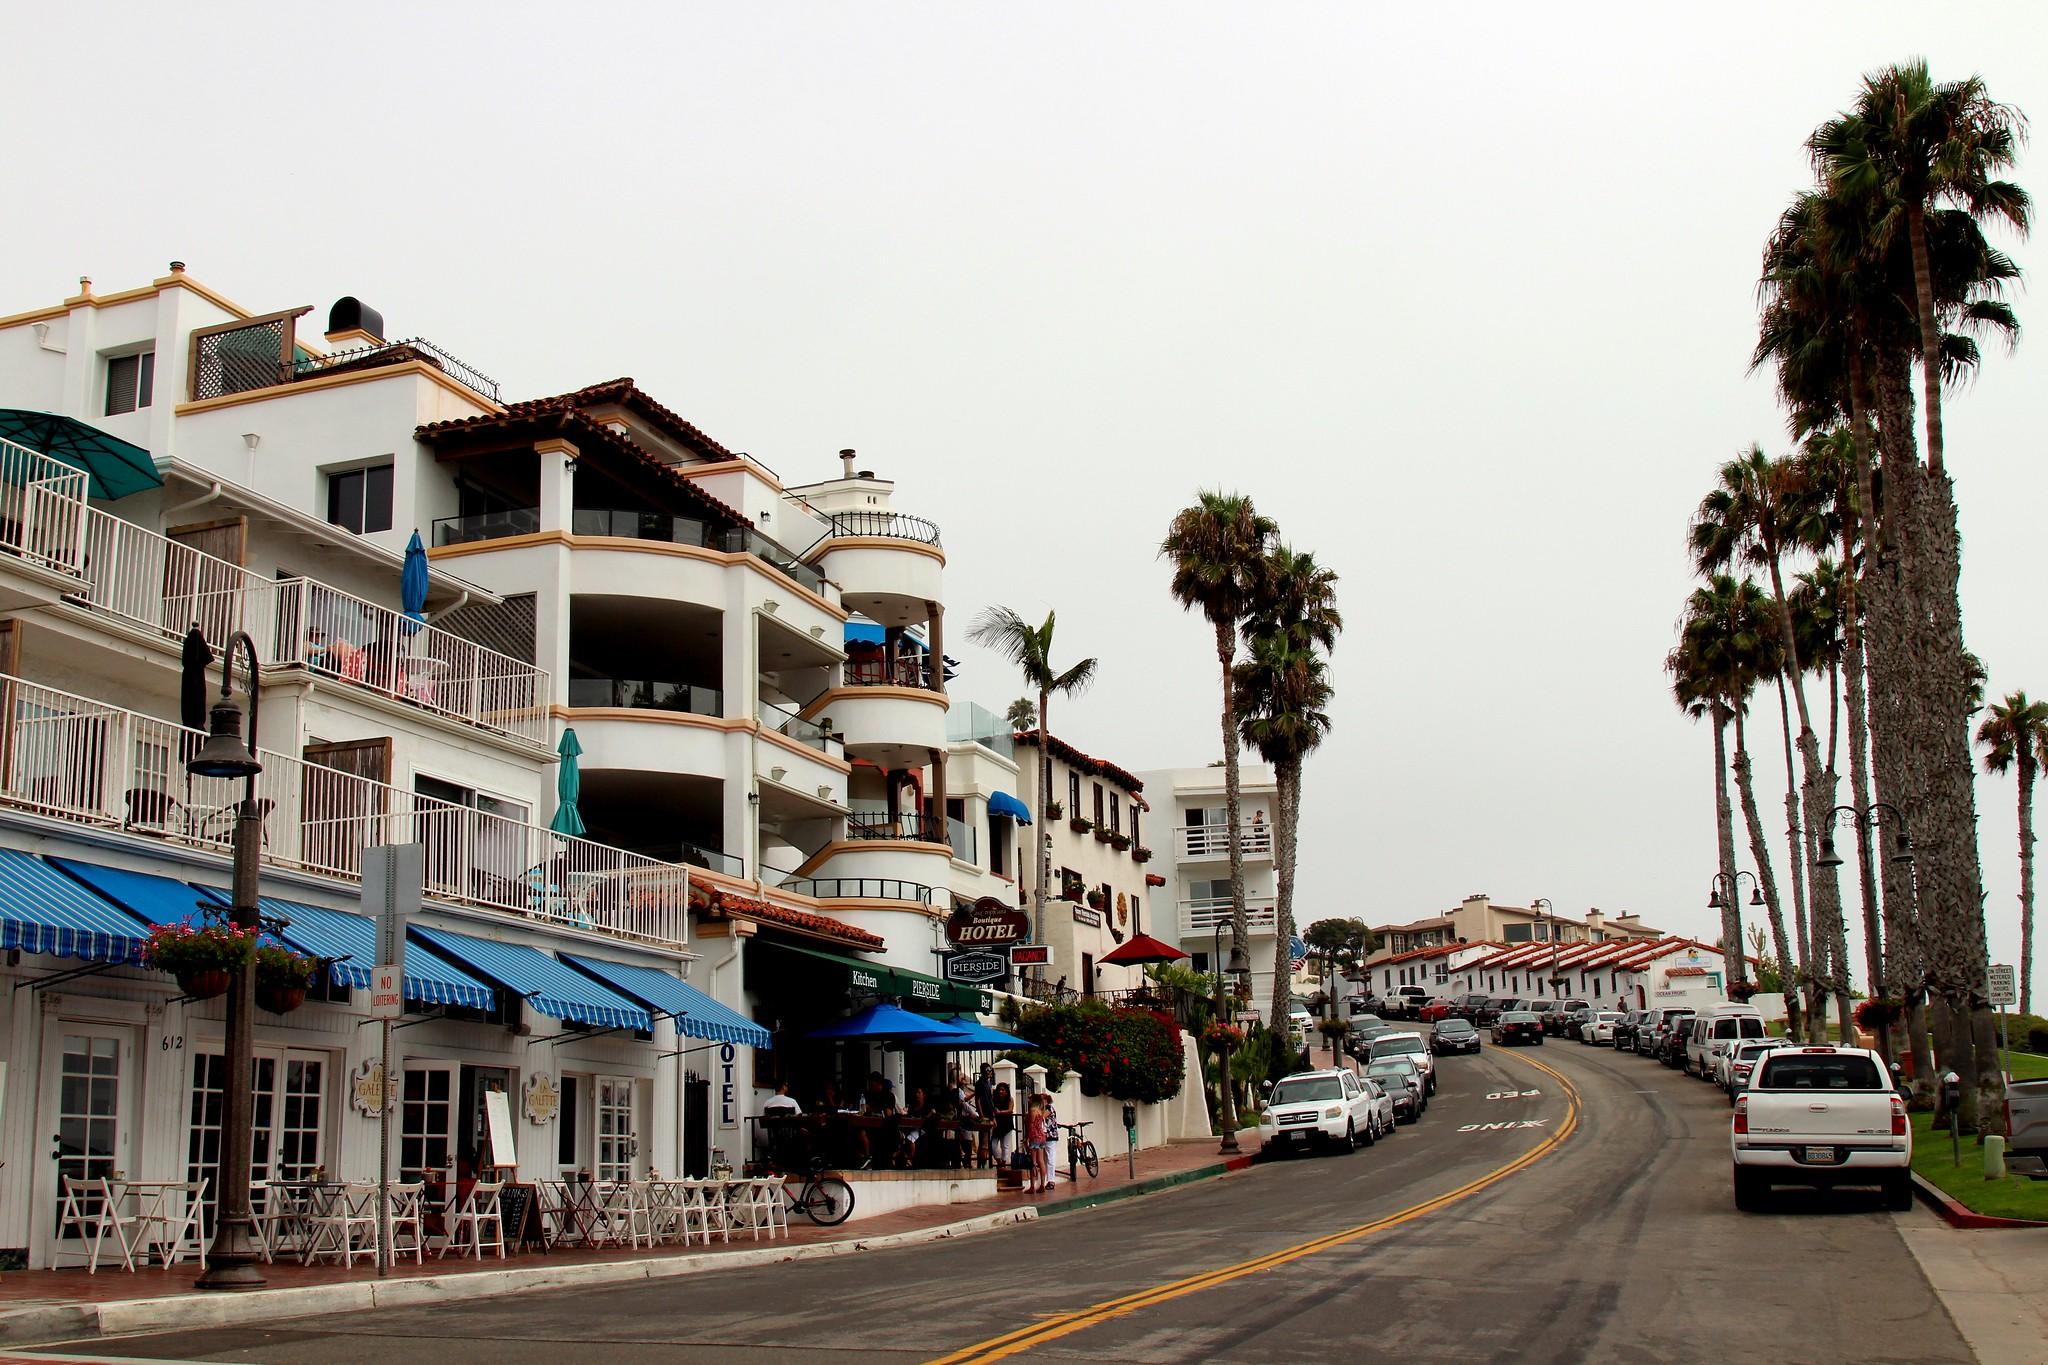 A quiet, cloudy beachside downtown.